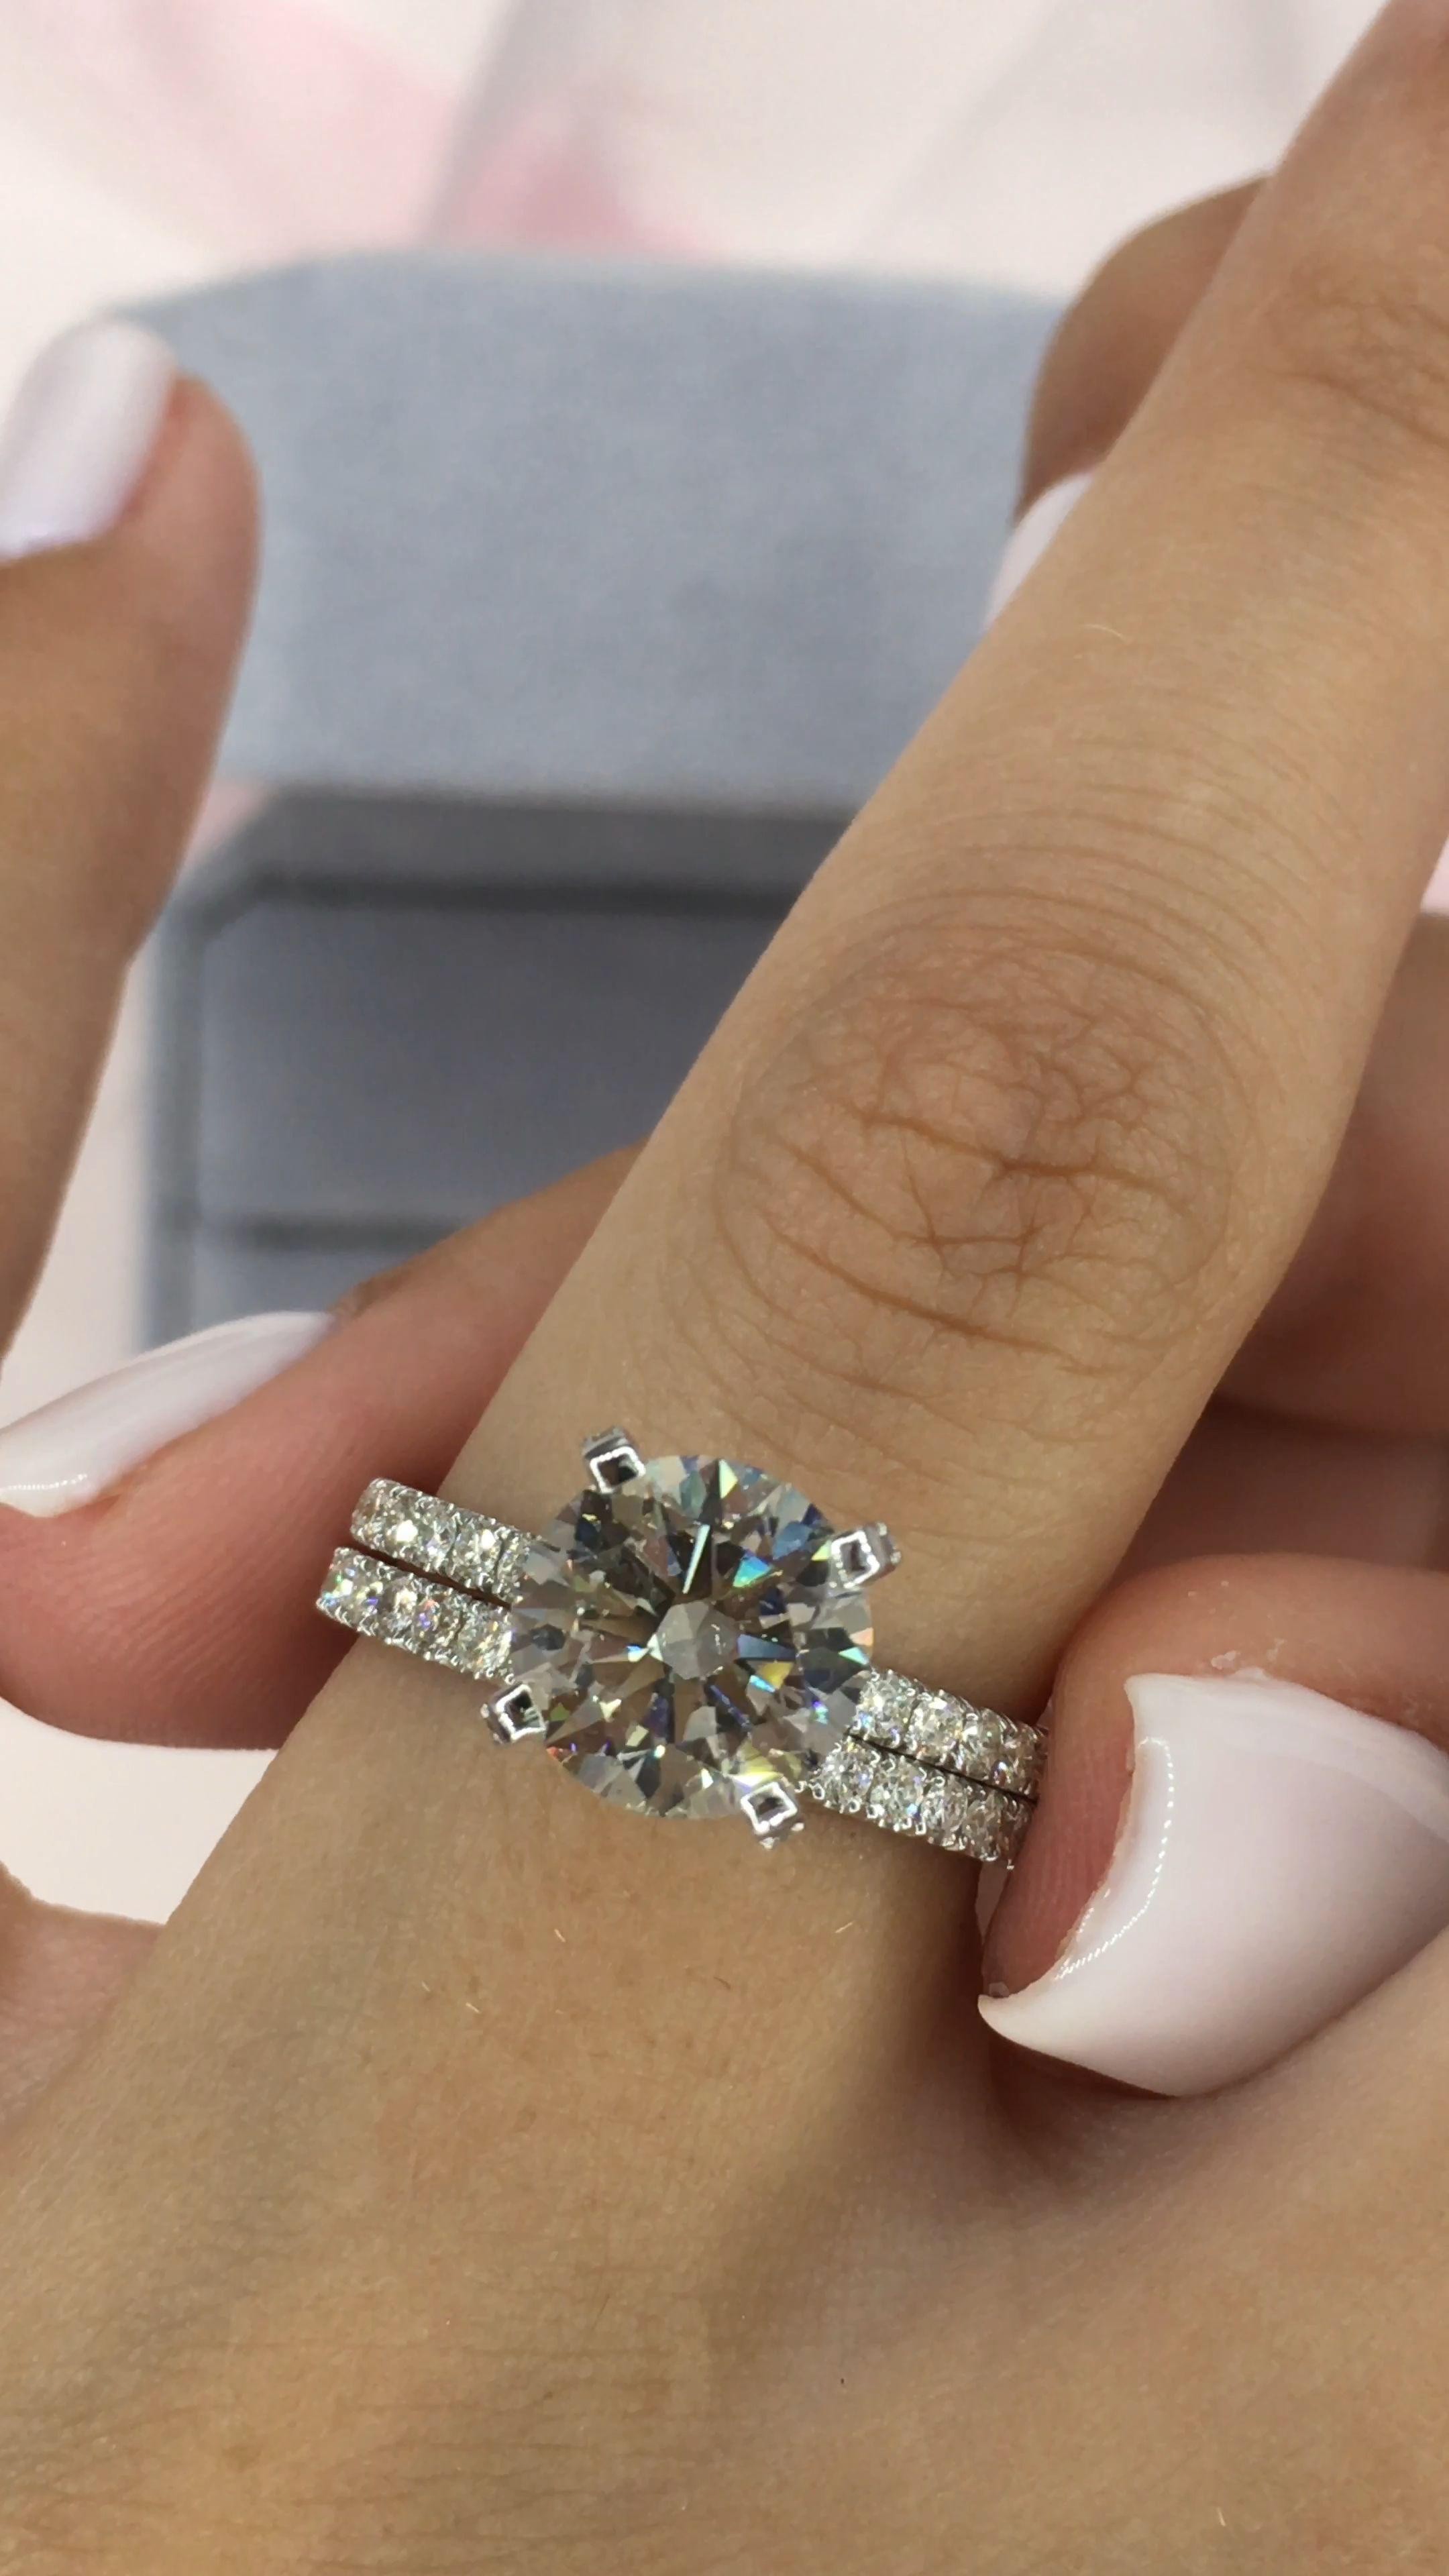 Diamond Engagement Ring 1 30 Carat Diamond Engagement Ring White Gold Ring Engagement In 2020 Big Wedding Rings Wedding Rings Engagement Dream Wedding Ring